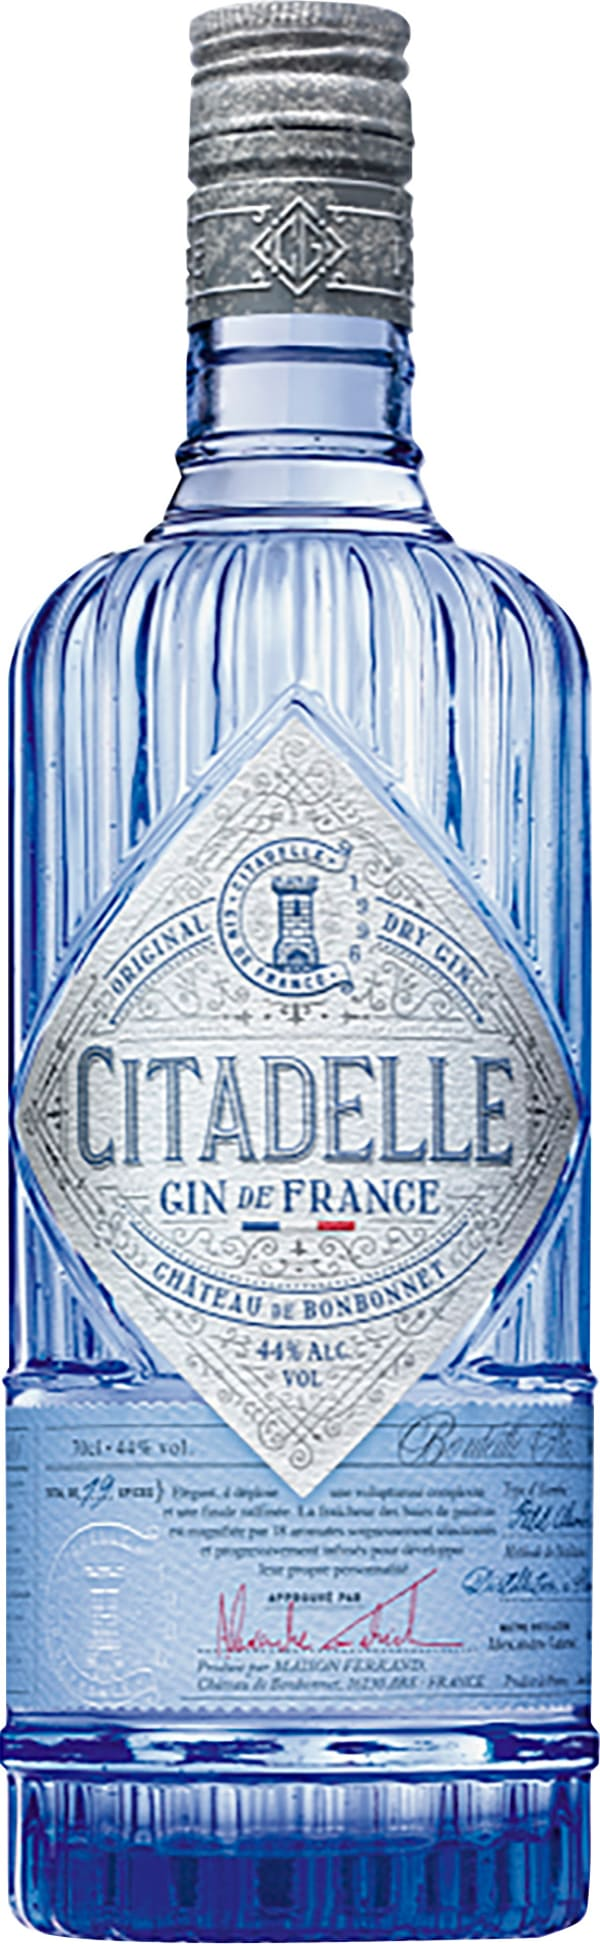 Citadelle Original Dry Gin